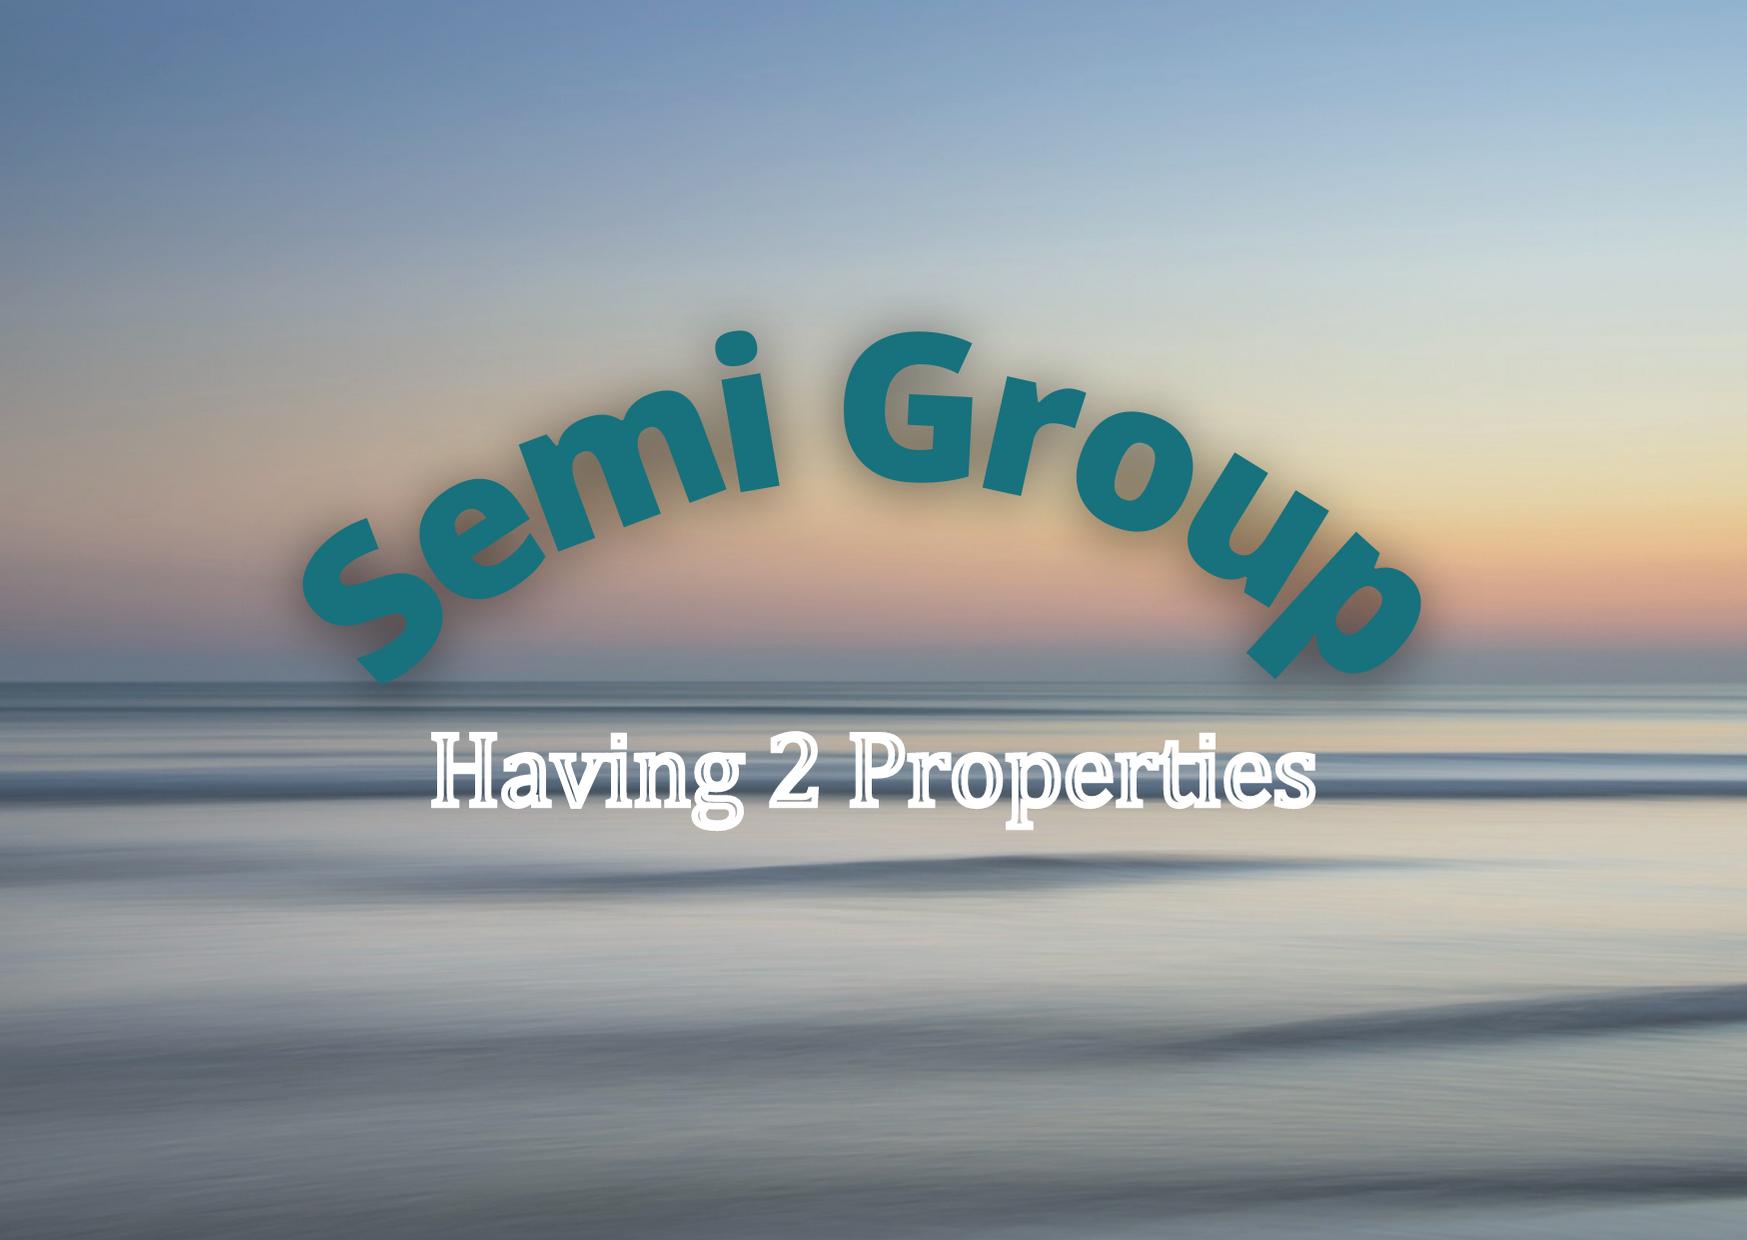 Semi Group